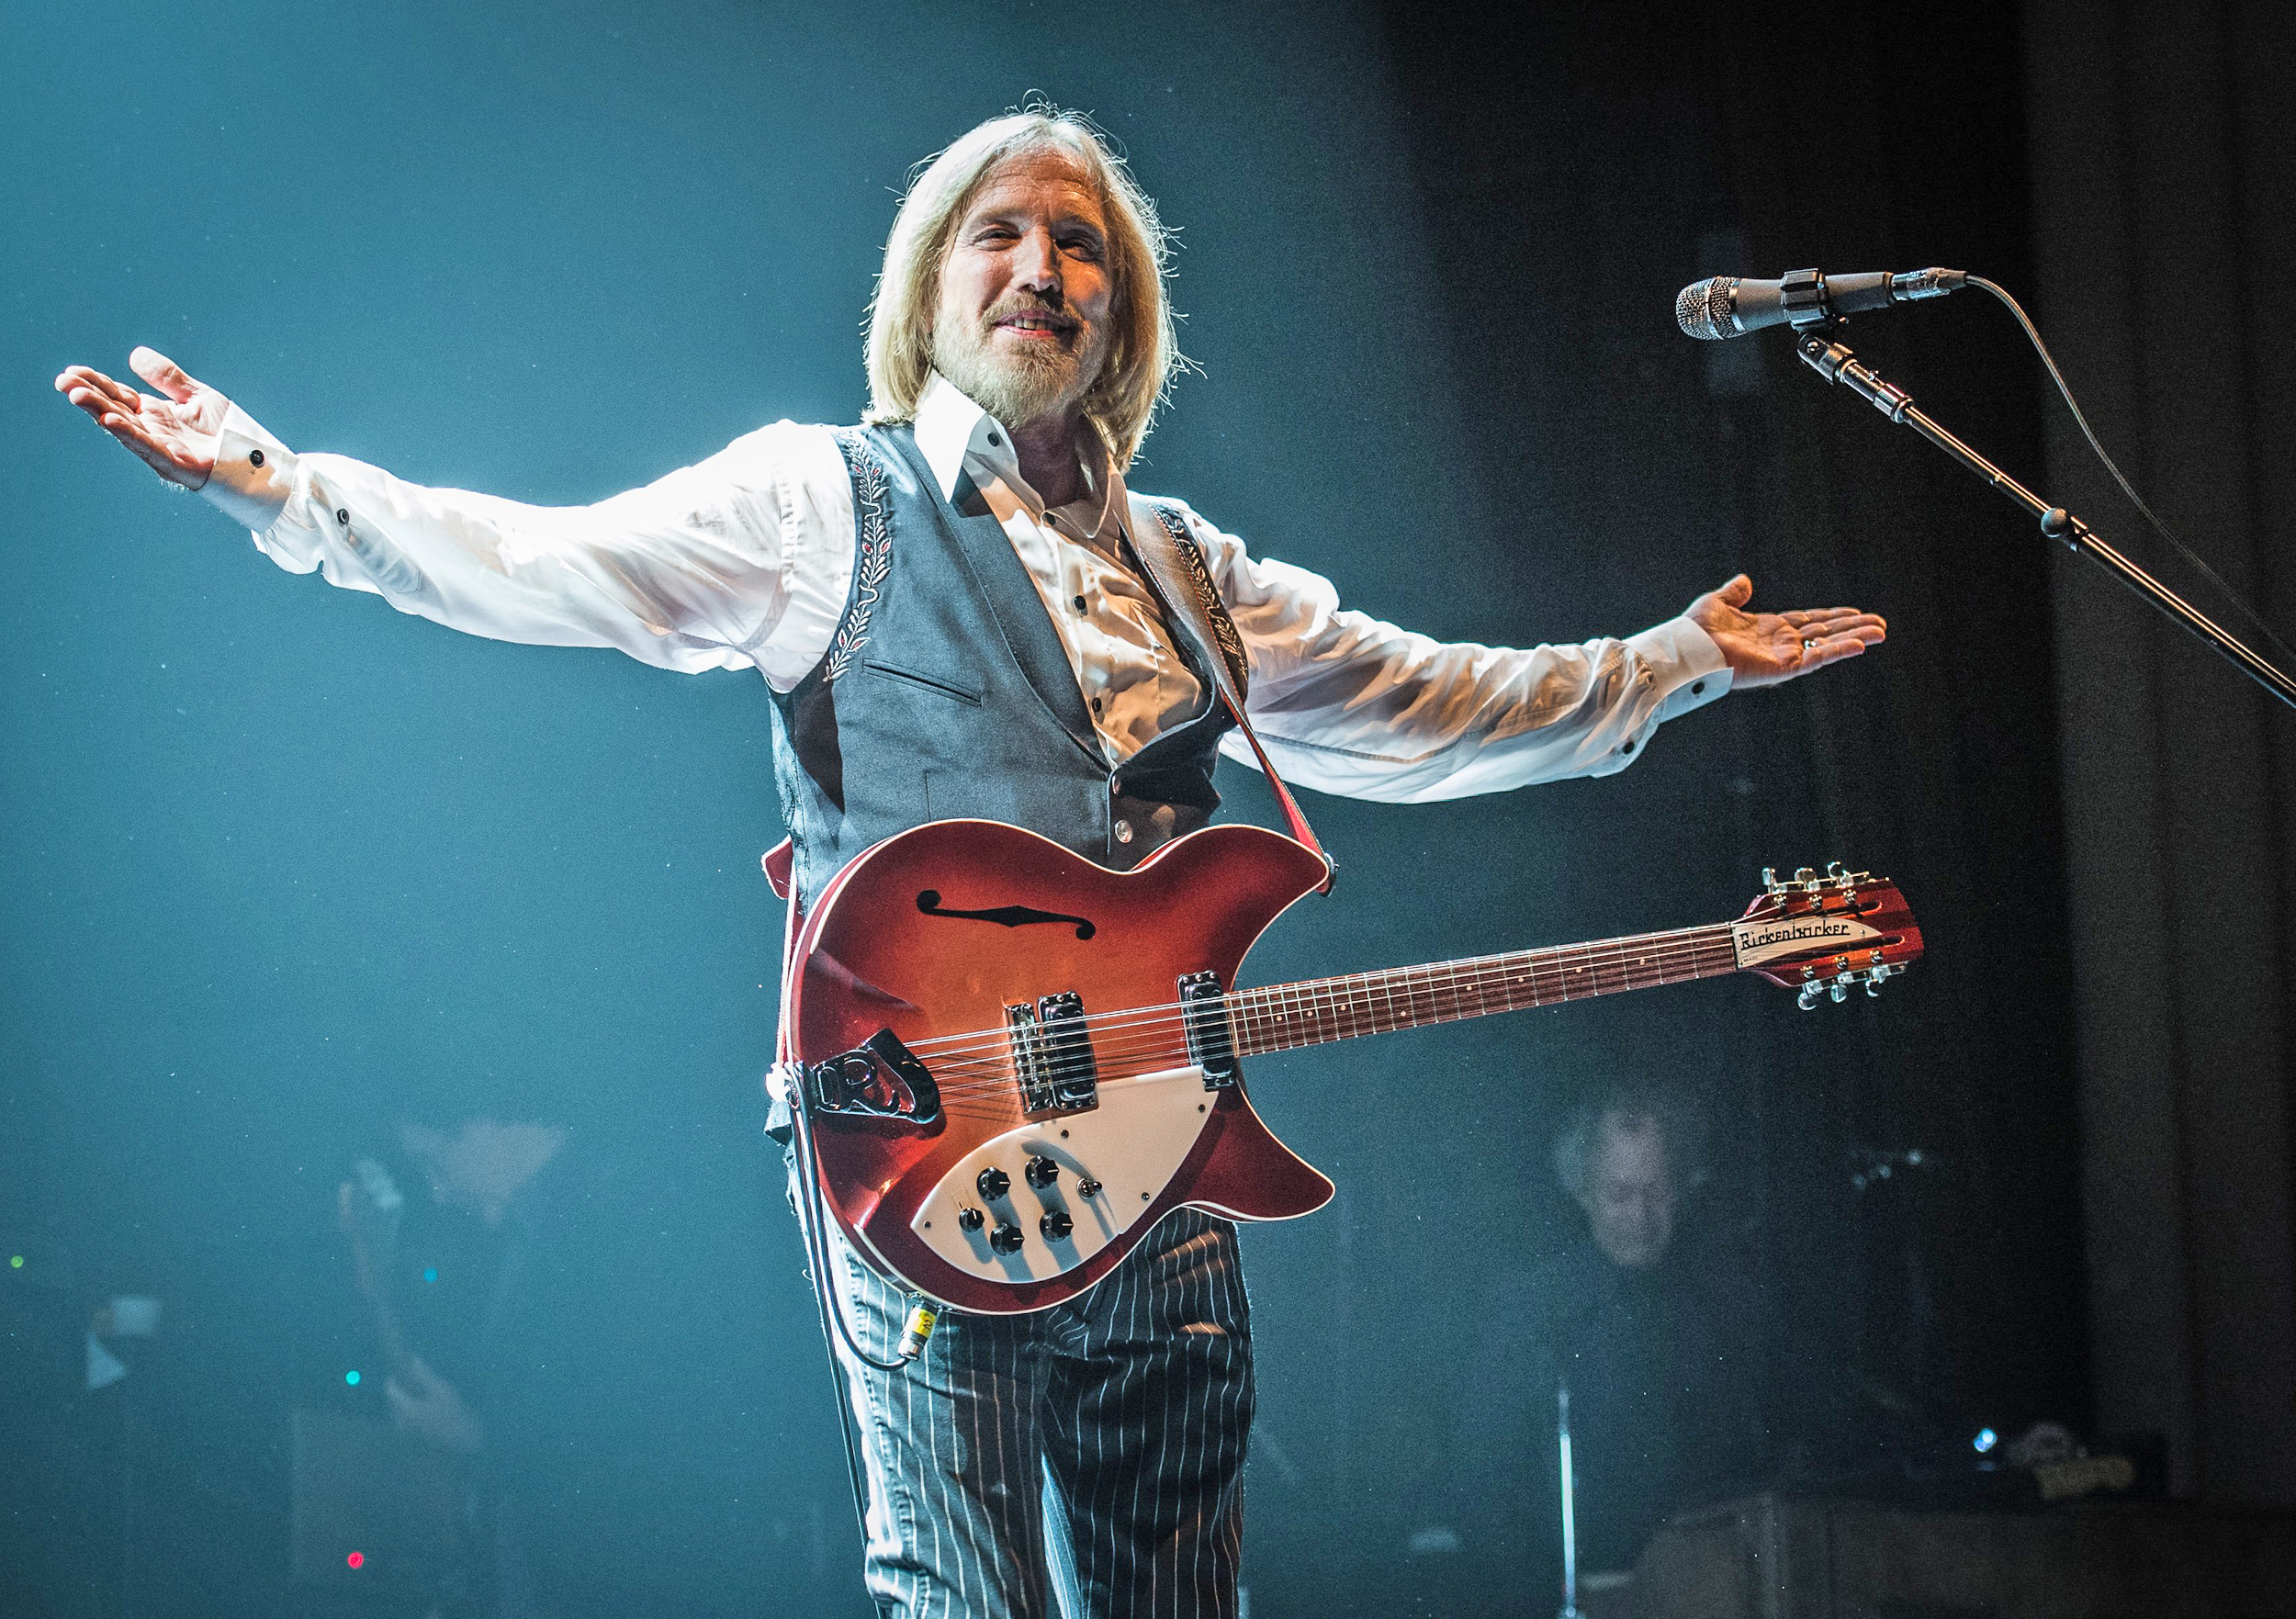 Image: Tom Petty